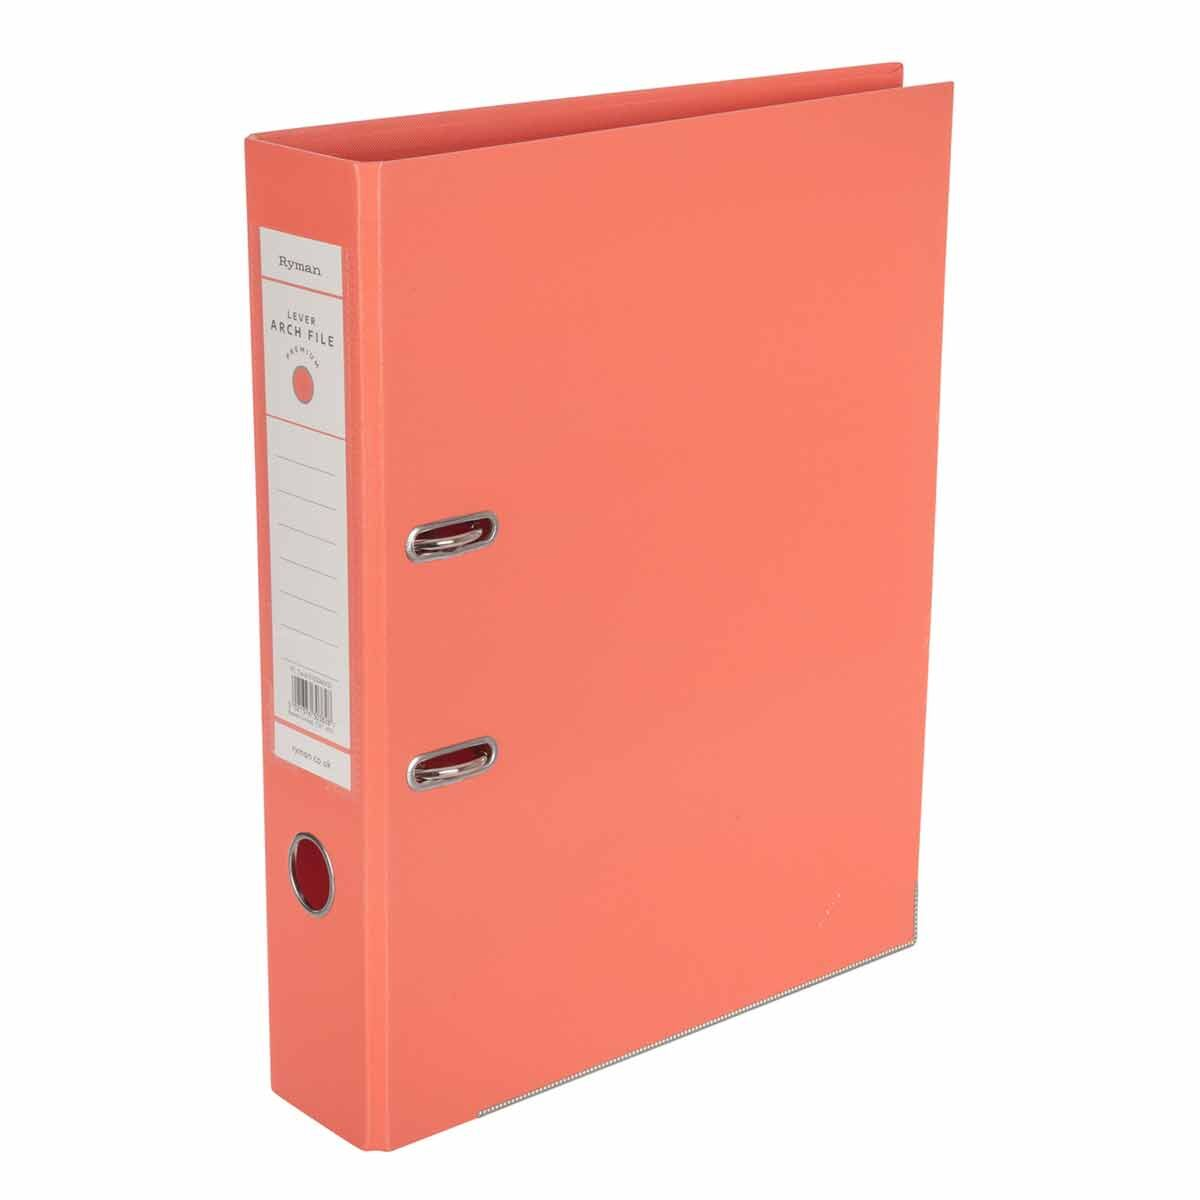 Ryman Premium Lever Arch File Foolscap Coral